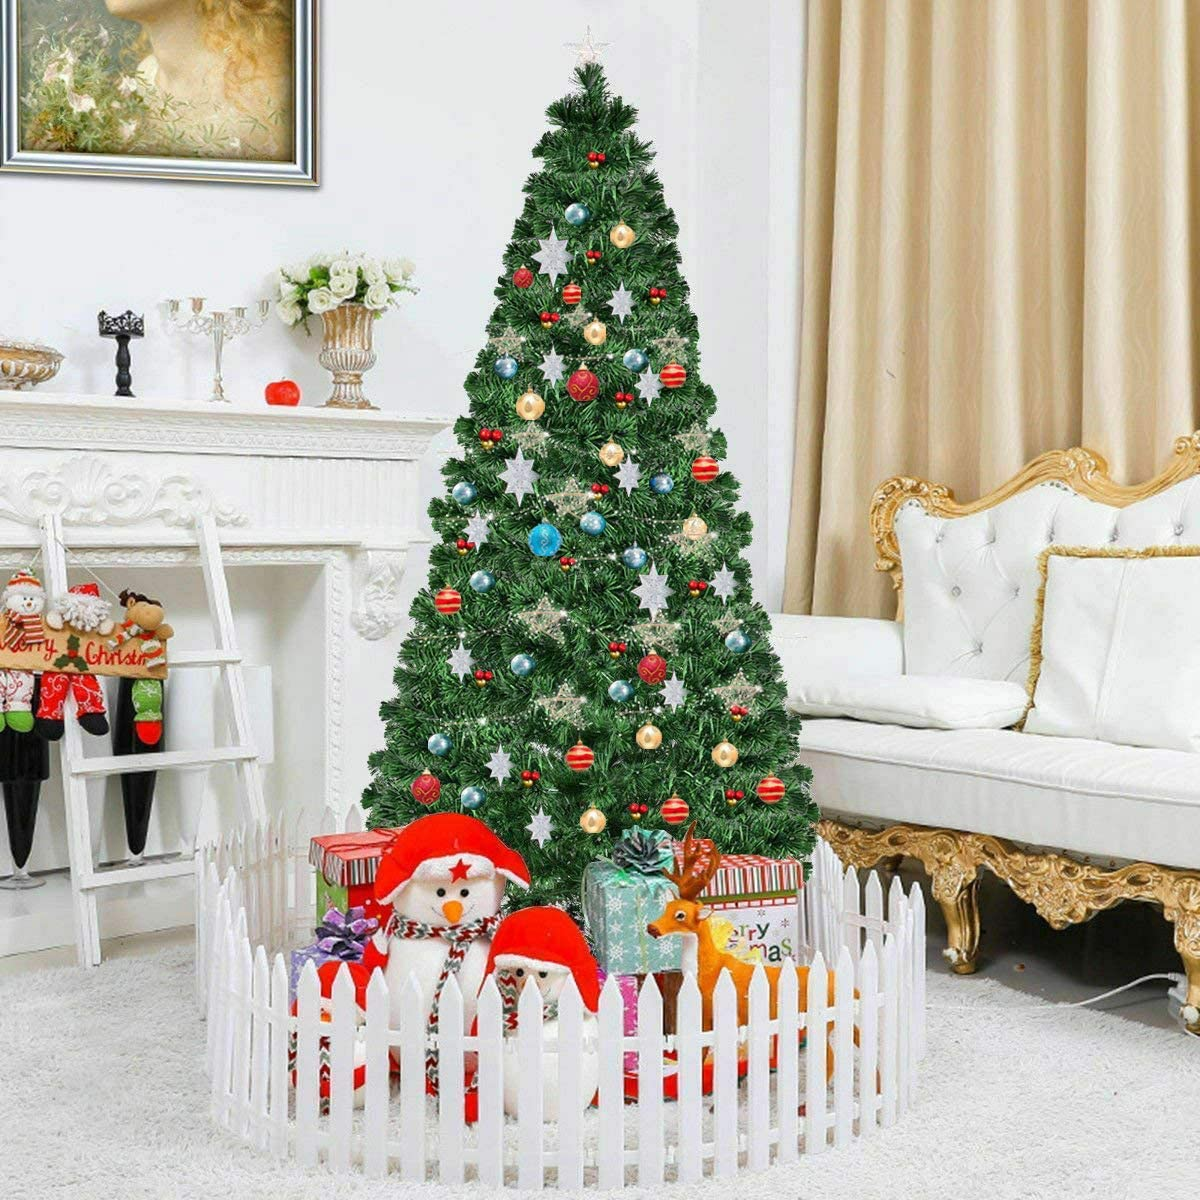 COSTWAY Ranking Phoenix Mall TOP1 7FT Artificial Christmas Pre-Lit Fiber Optical 8 Tree Fl